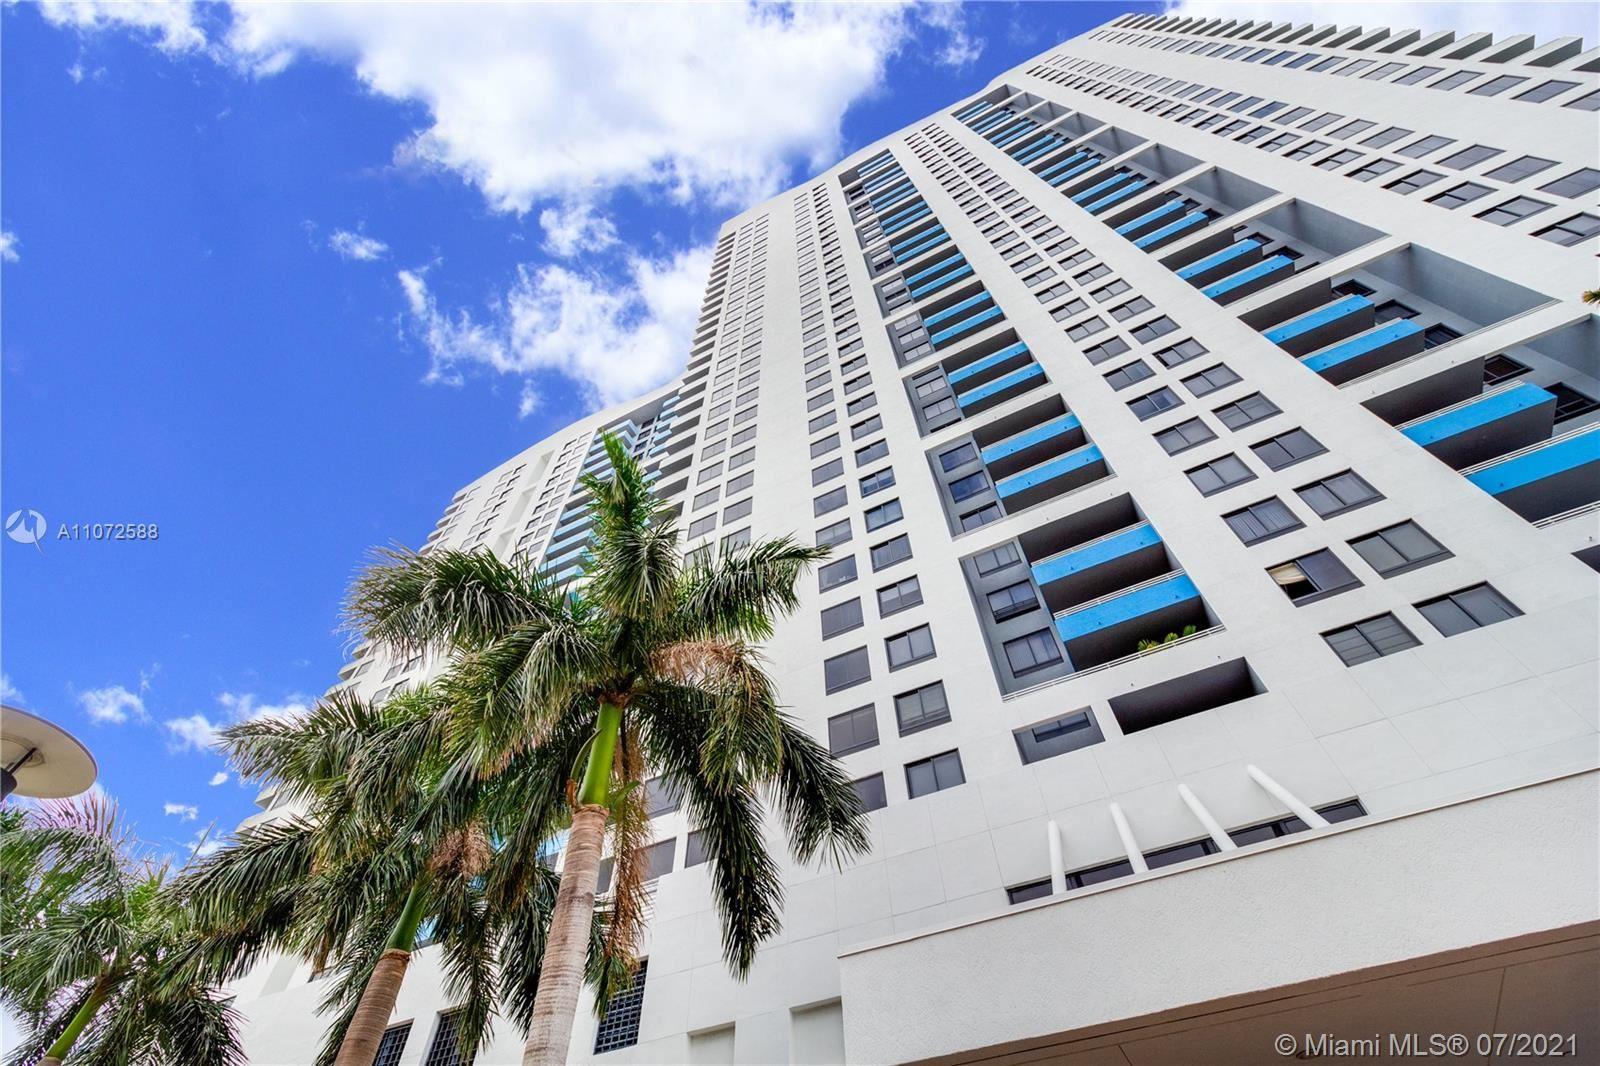 1330 West Ave #1408, Miami Beach, FL 33139 - #: A11072588